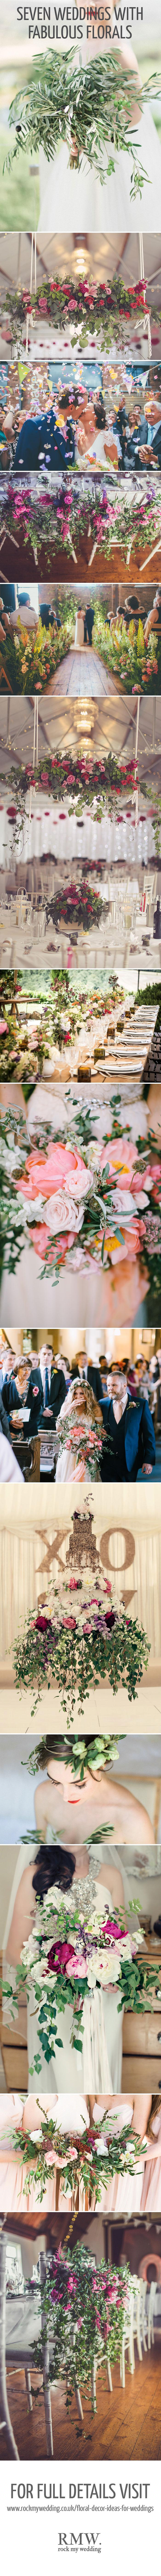 Fabulous Floral Weddings